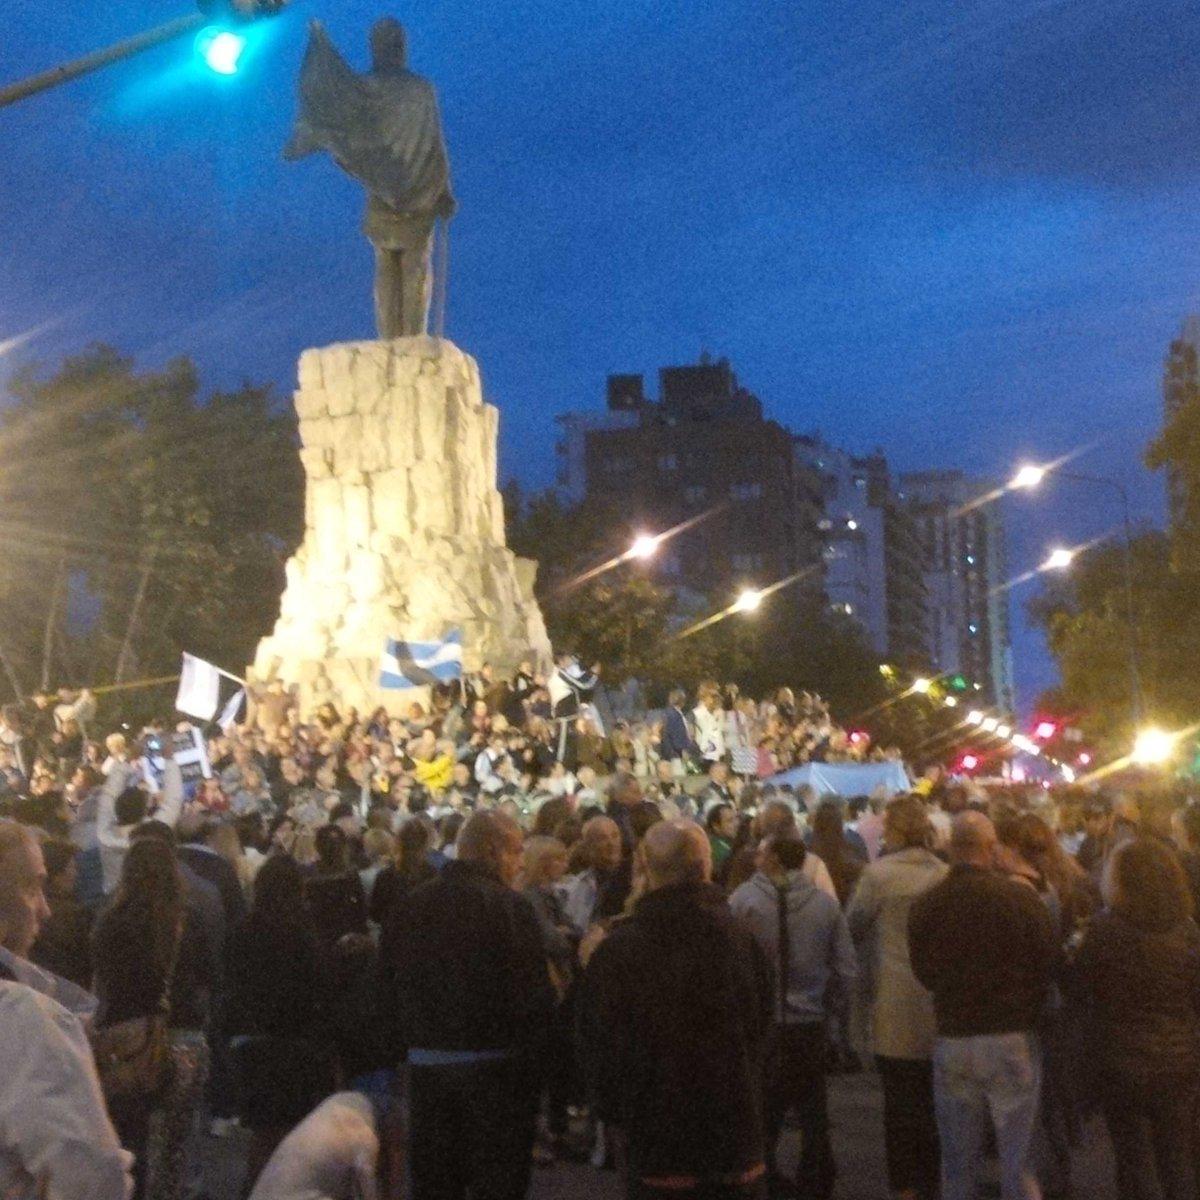 Mar del Plata - La gente se manifiesta. La gente pide justicia #lamuertedenisman http://t.co/dfLETXp3N4